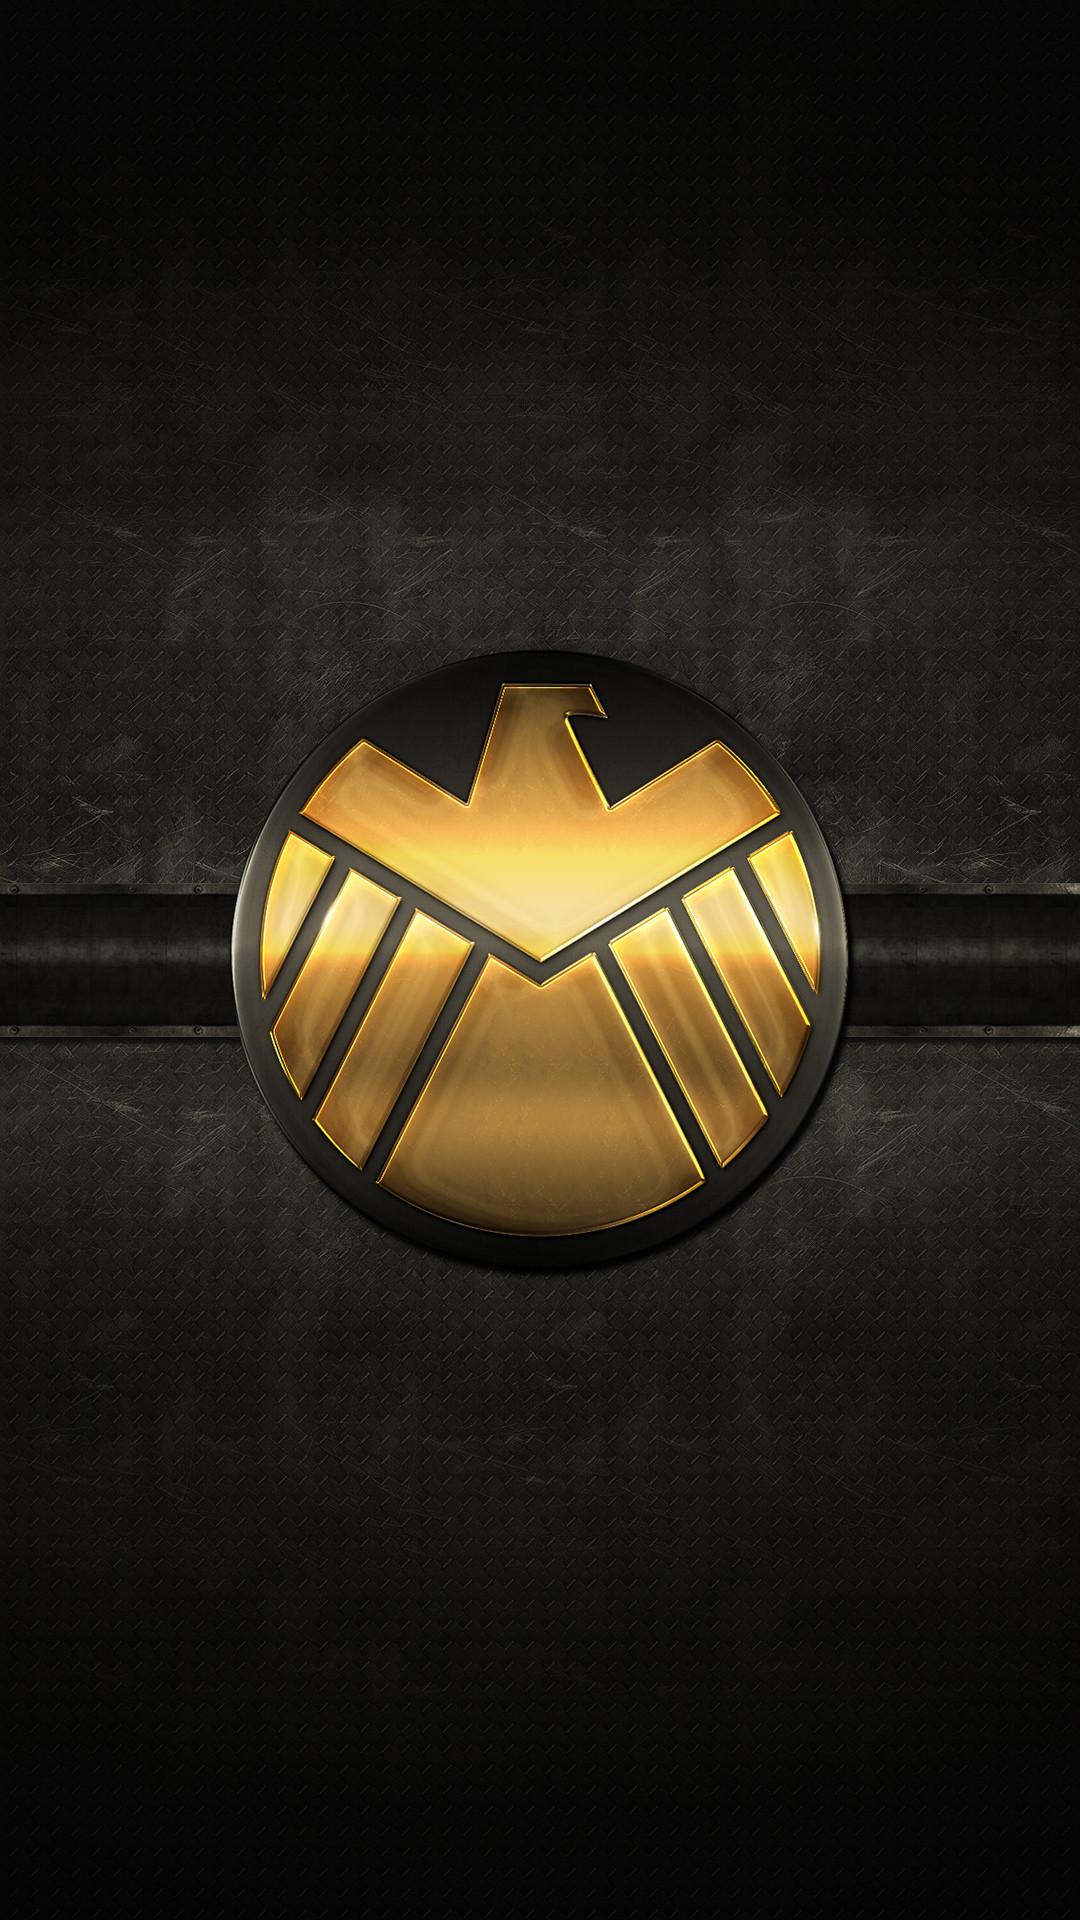 agent marvel of shield